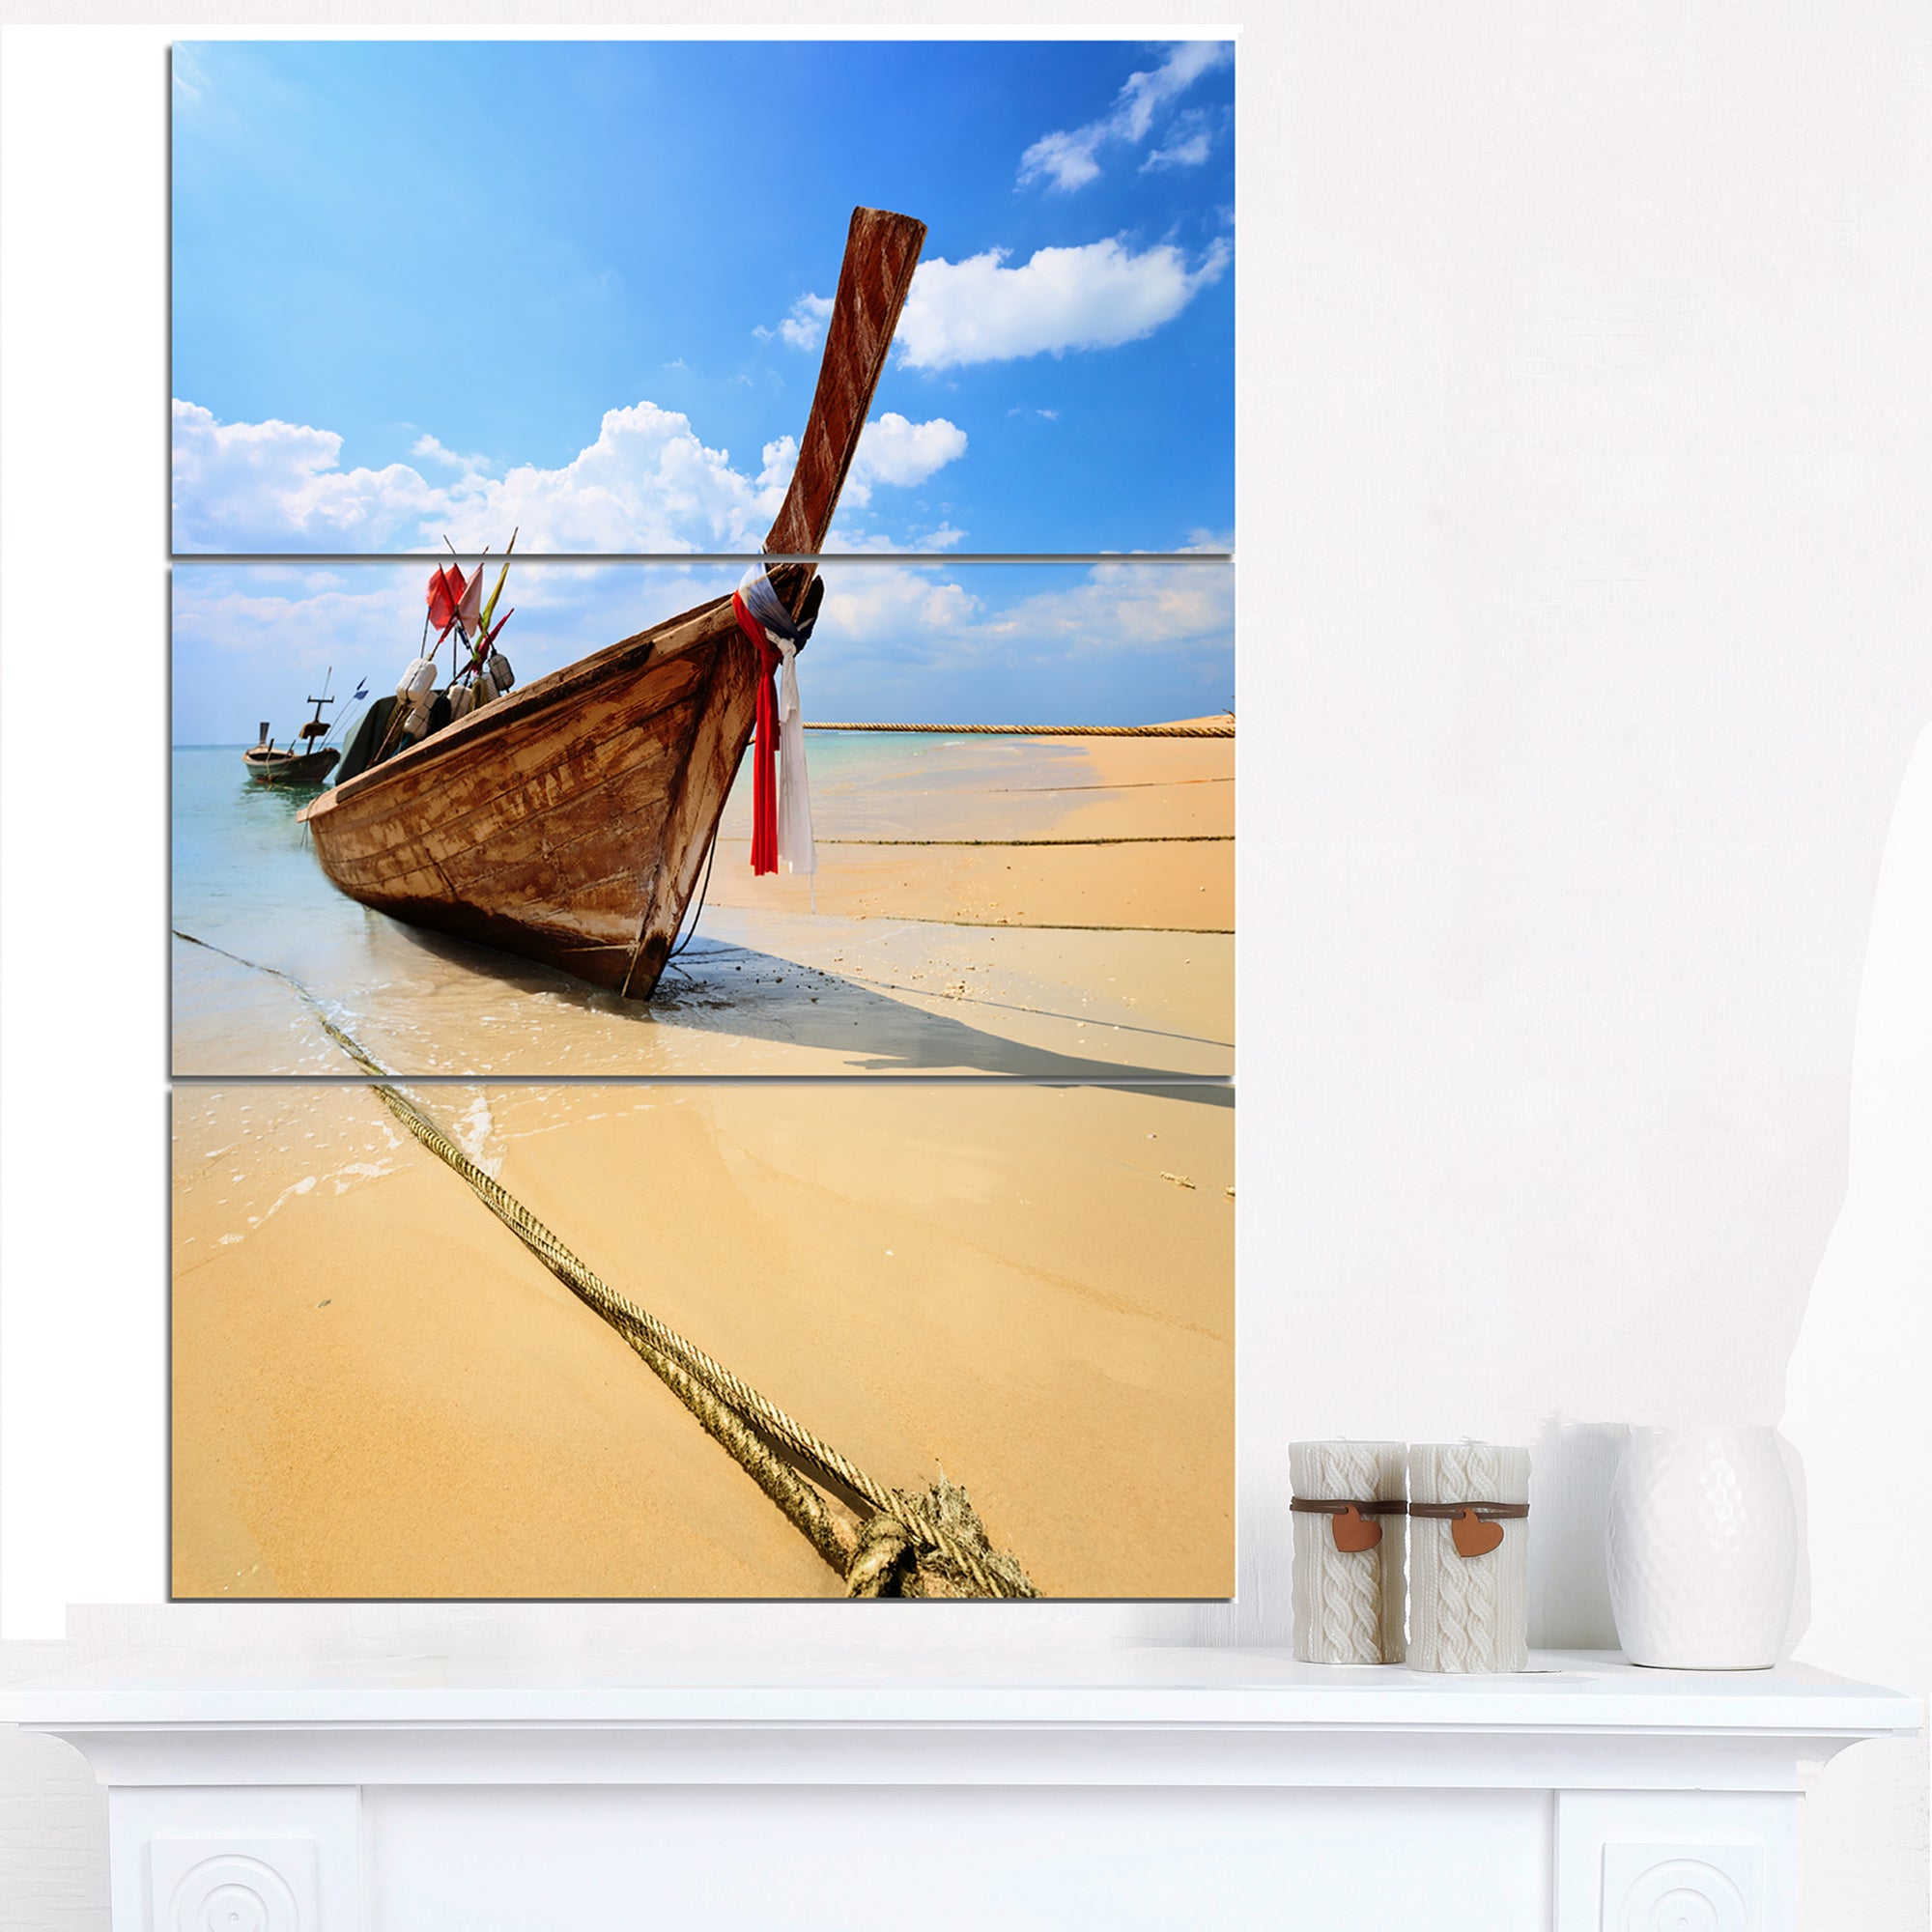 Enchanting Metal Boat Wall Decor Photos - Wall Art Collections ...